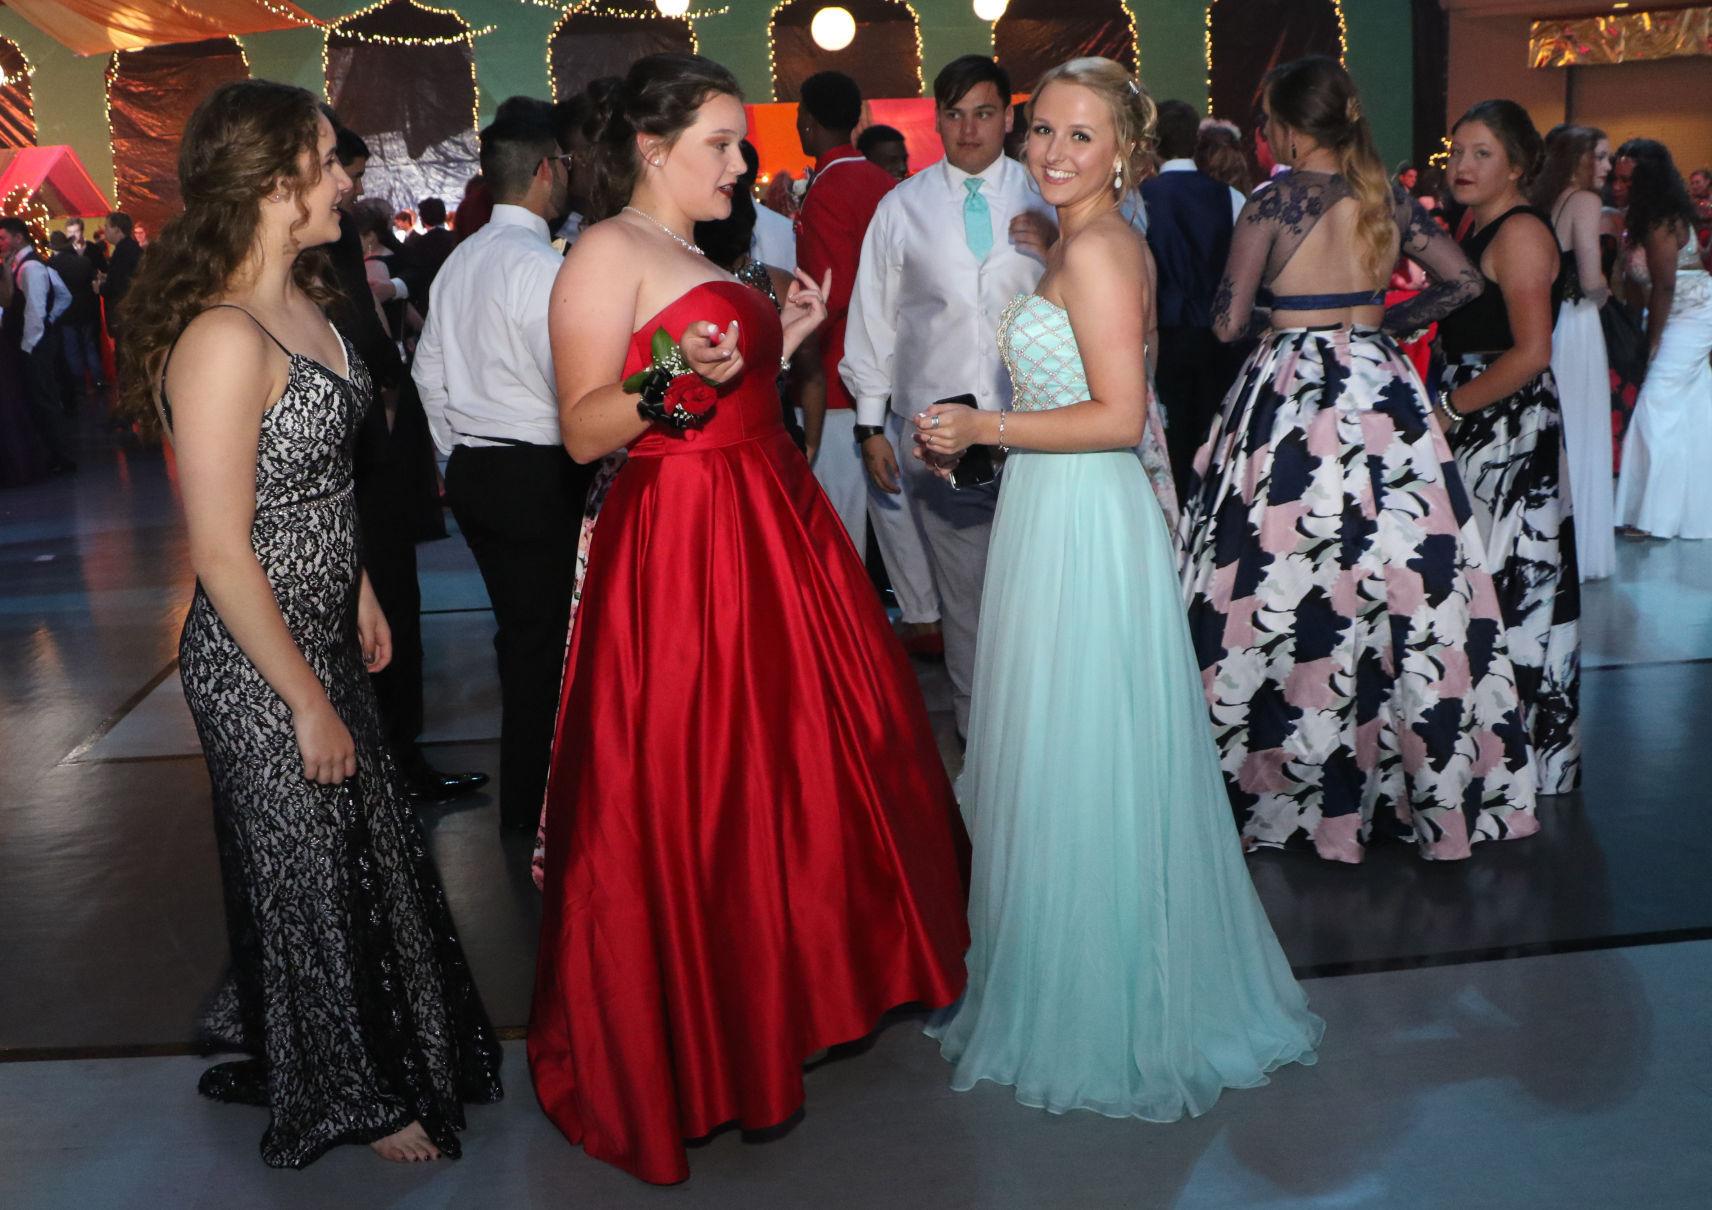 Photo Gallery Union High School prom